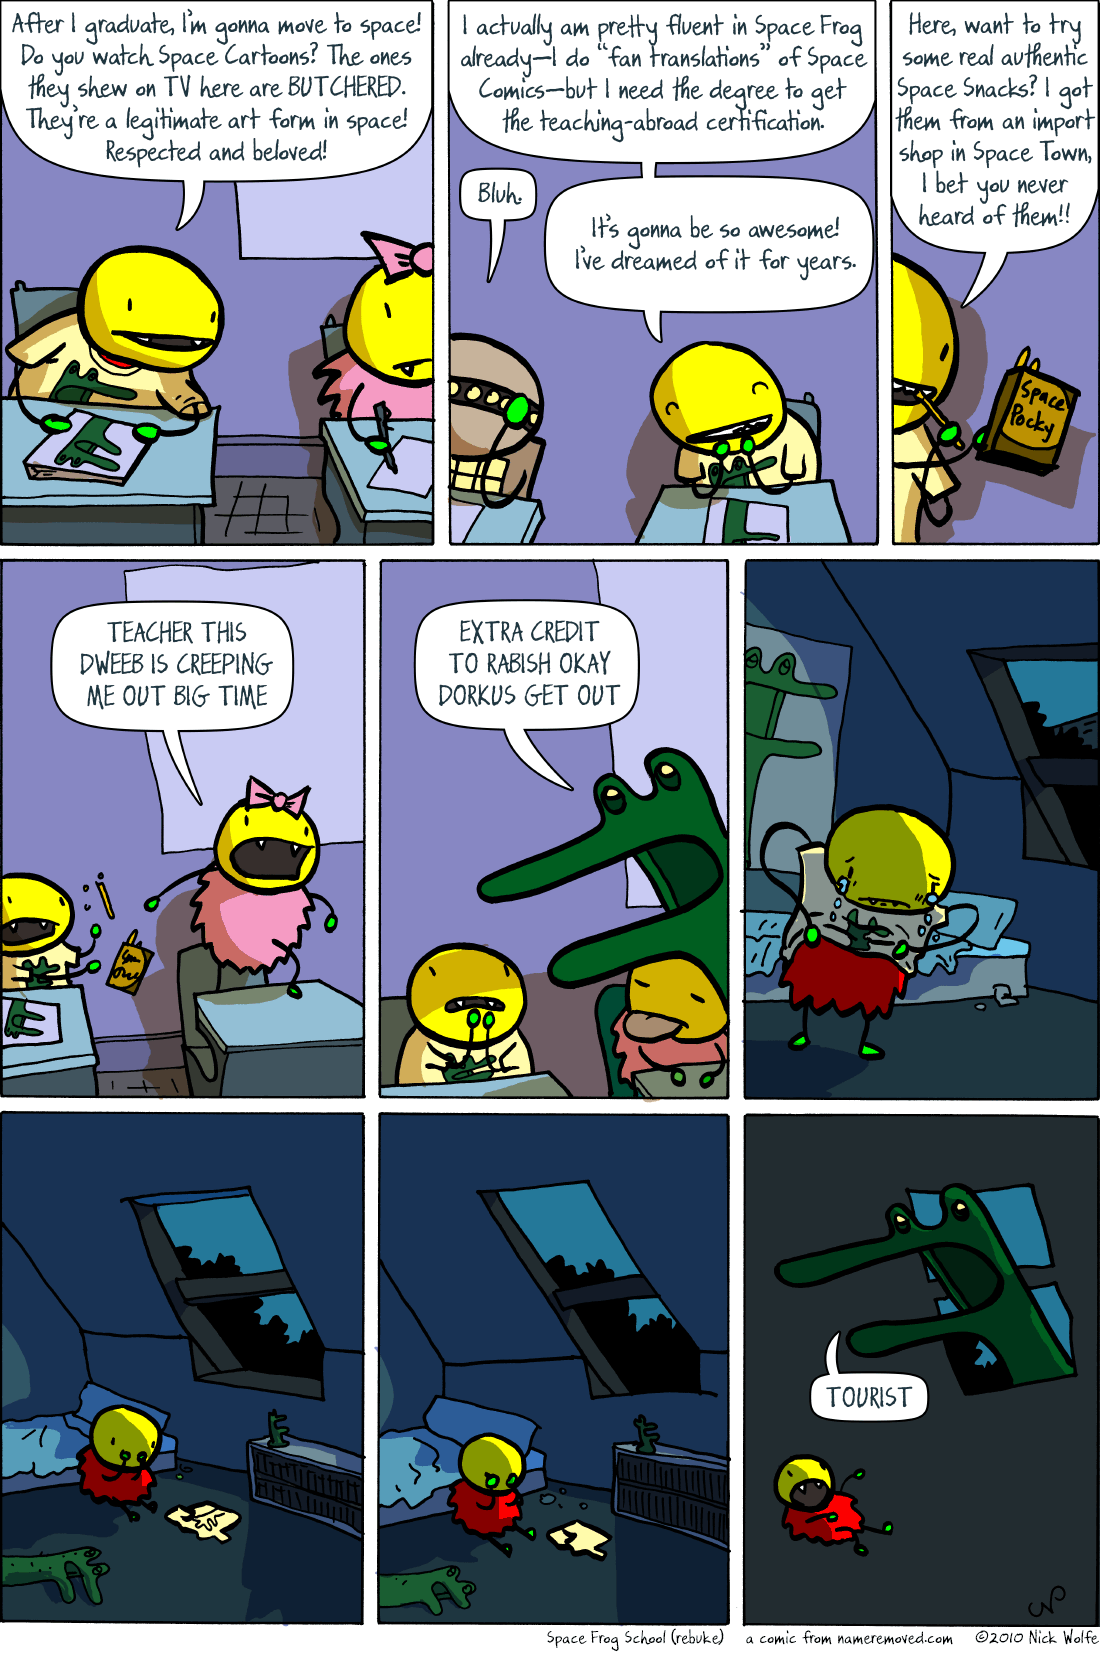 Space Frog School (rebuke)